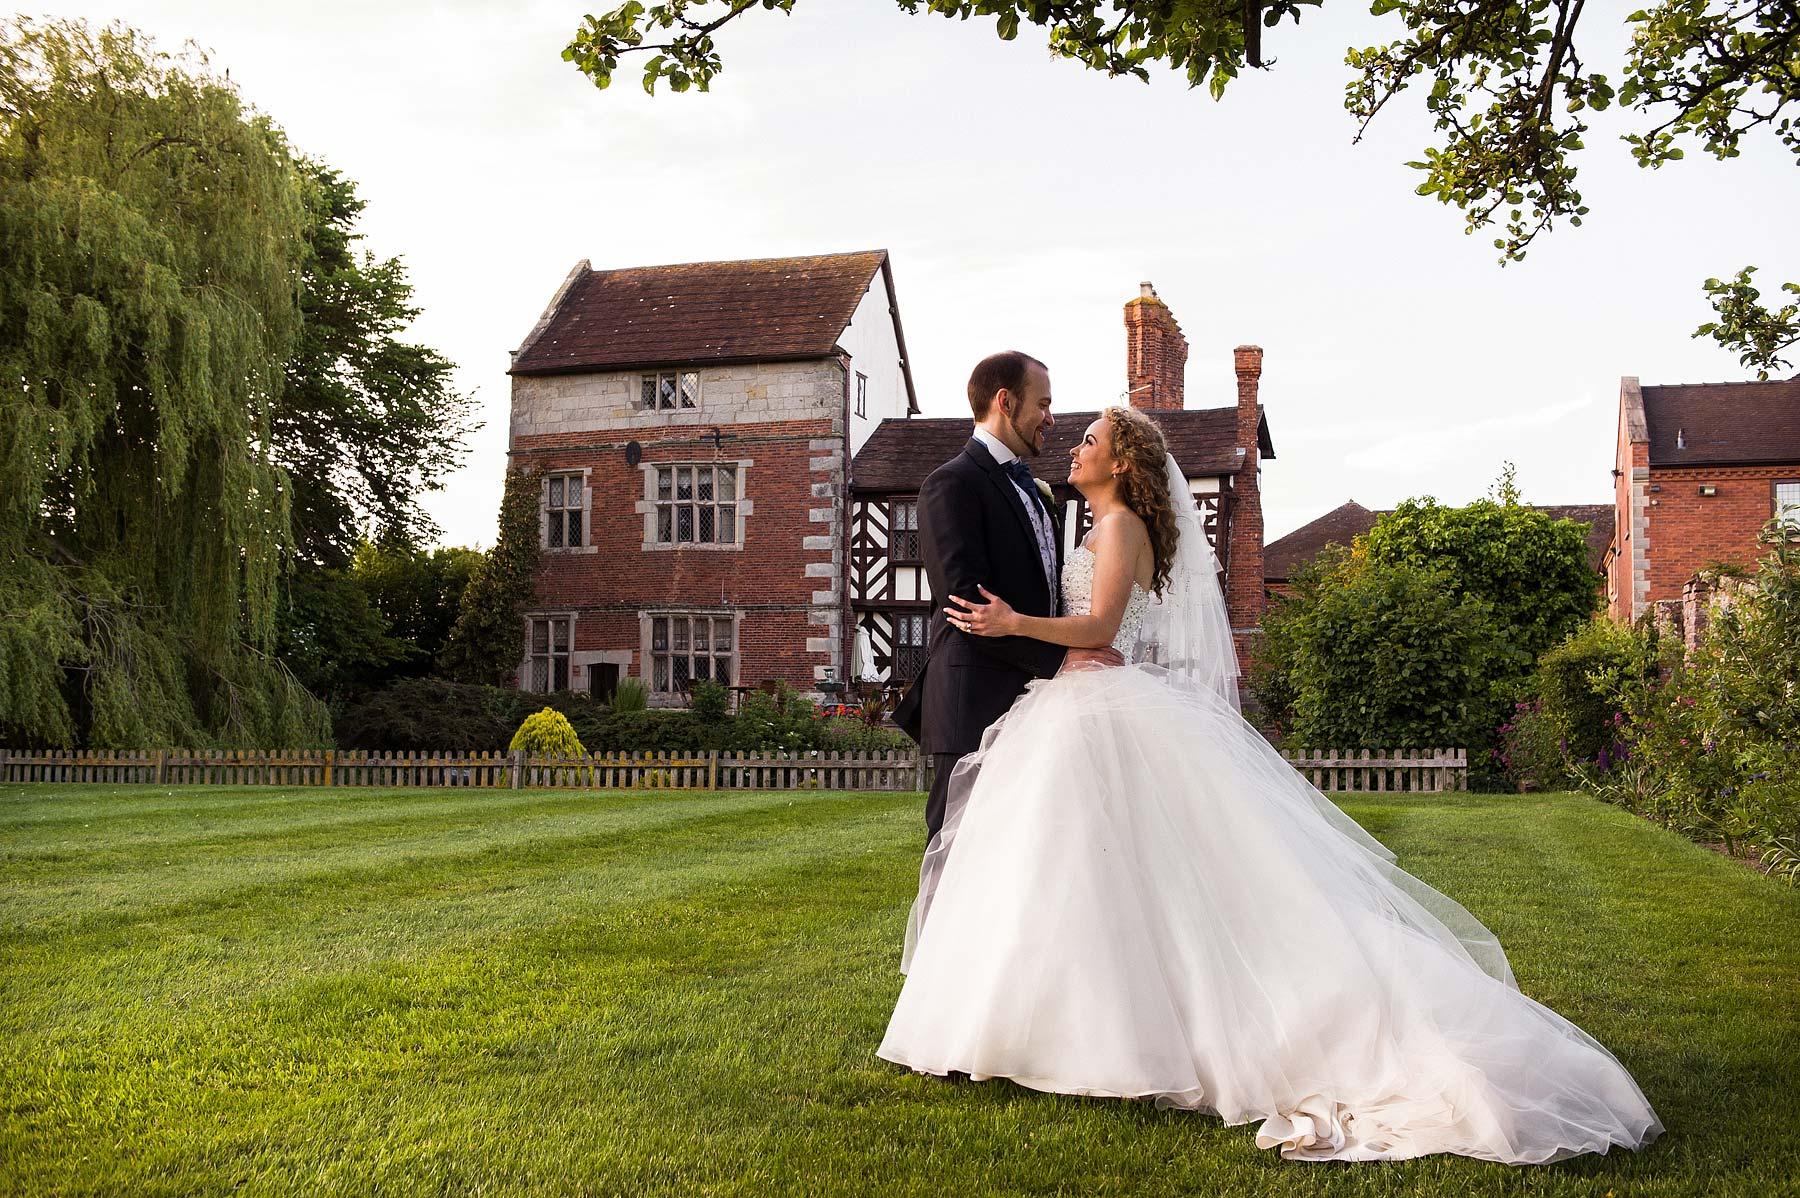 albright-hussey-manor-wedding-photographers-062